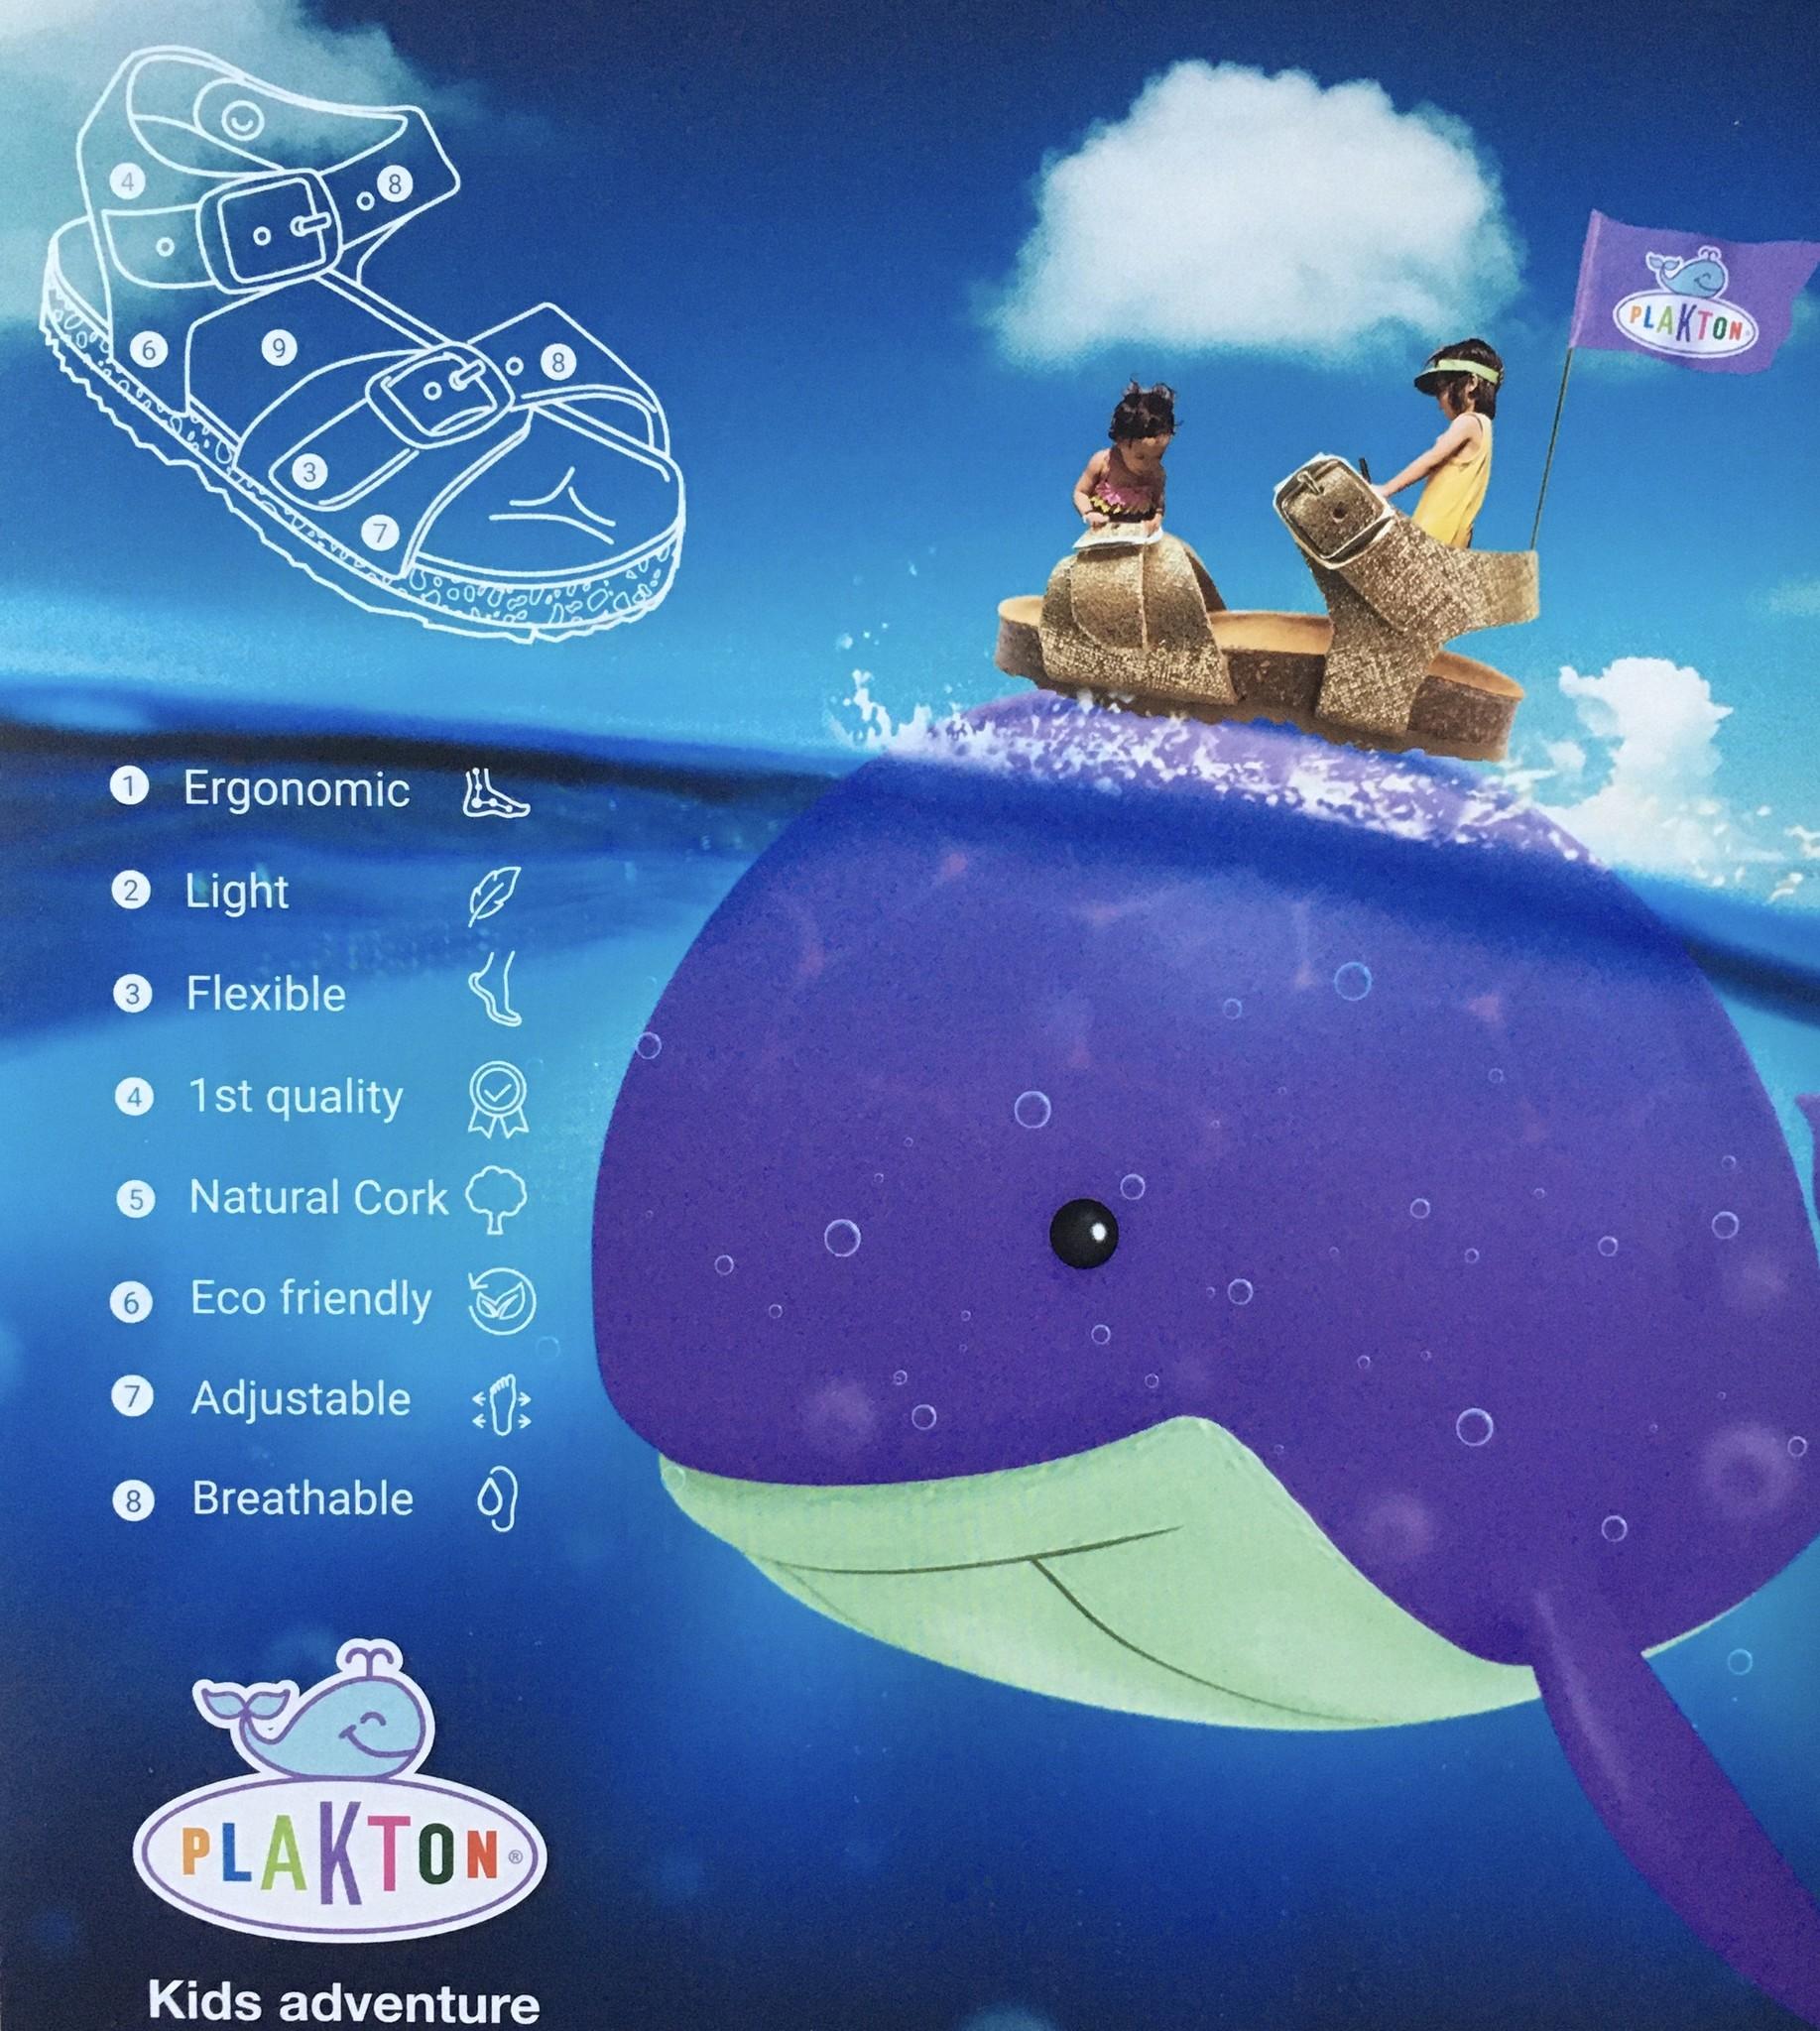 PLAKTON SANDALS leren kinderslipper kurk BOLERO - nubuckleer terracotta  - 24 tm 34